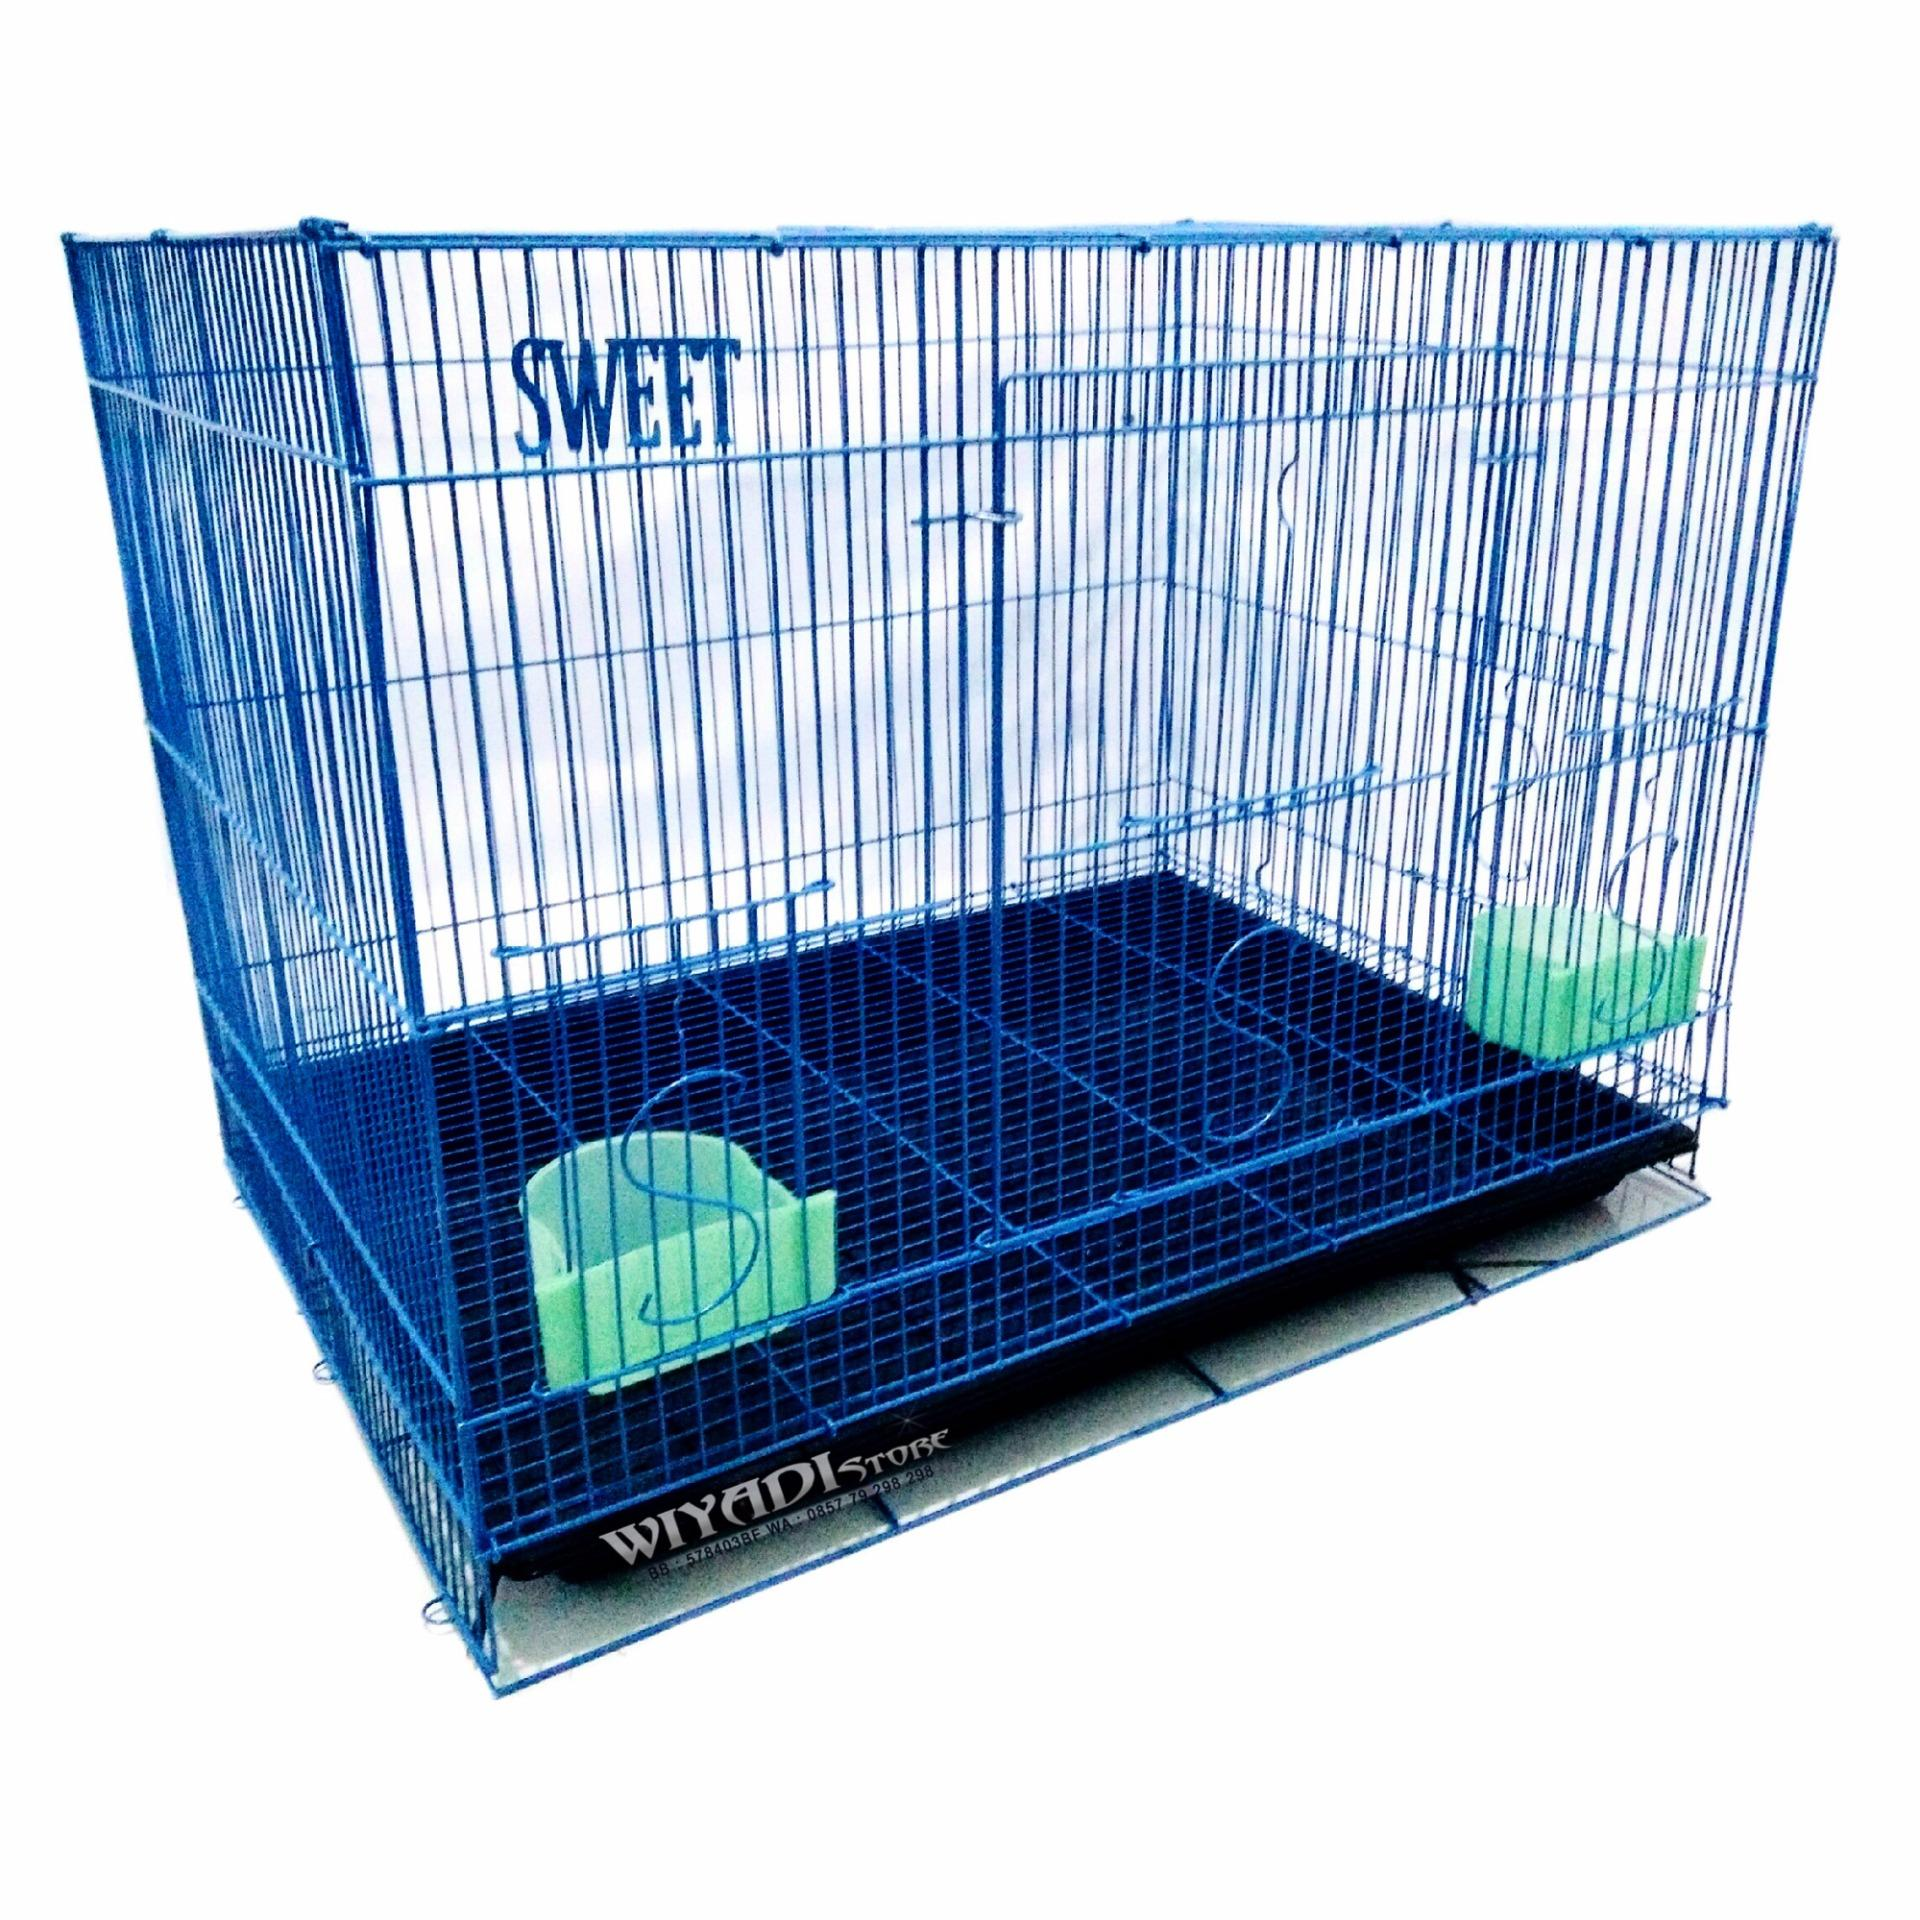 Toko Wiyadistore K12 Kandang Kucing Besi Lipat Besar 60P Biru Online Terpercaya